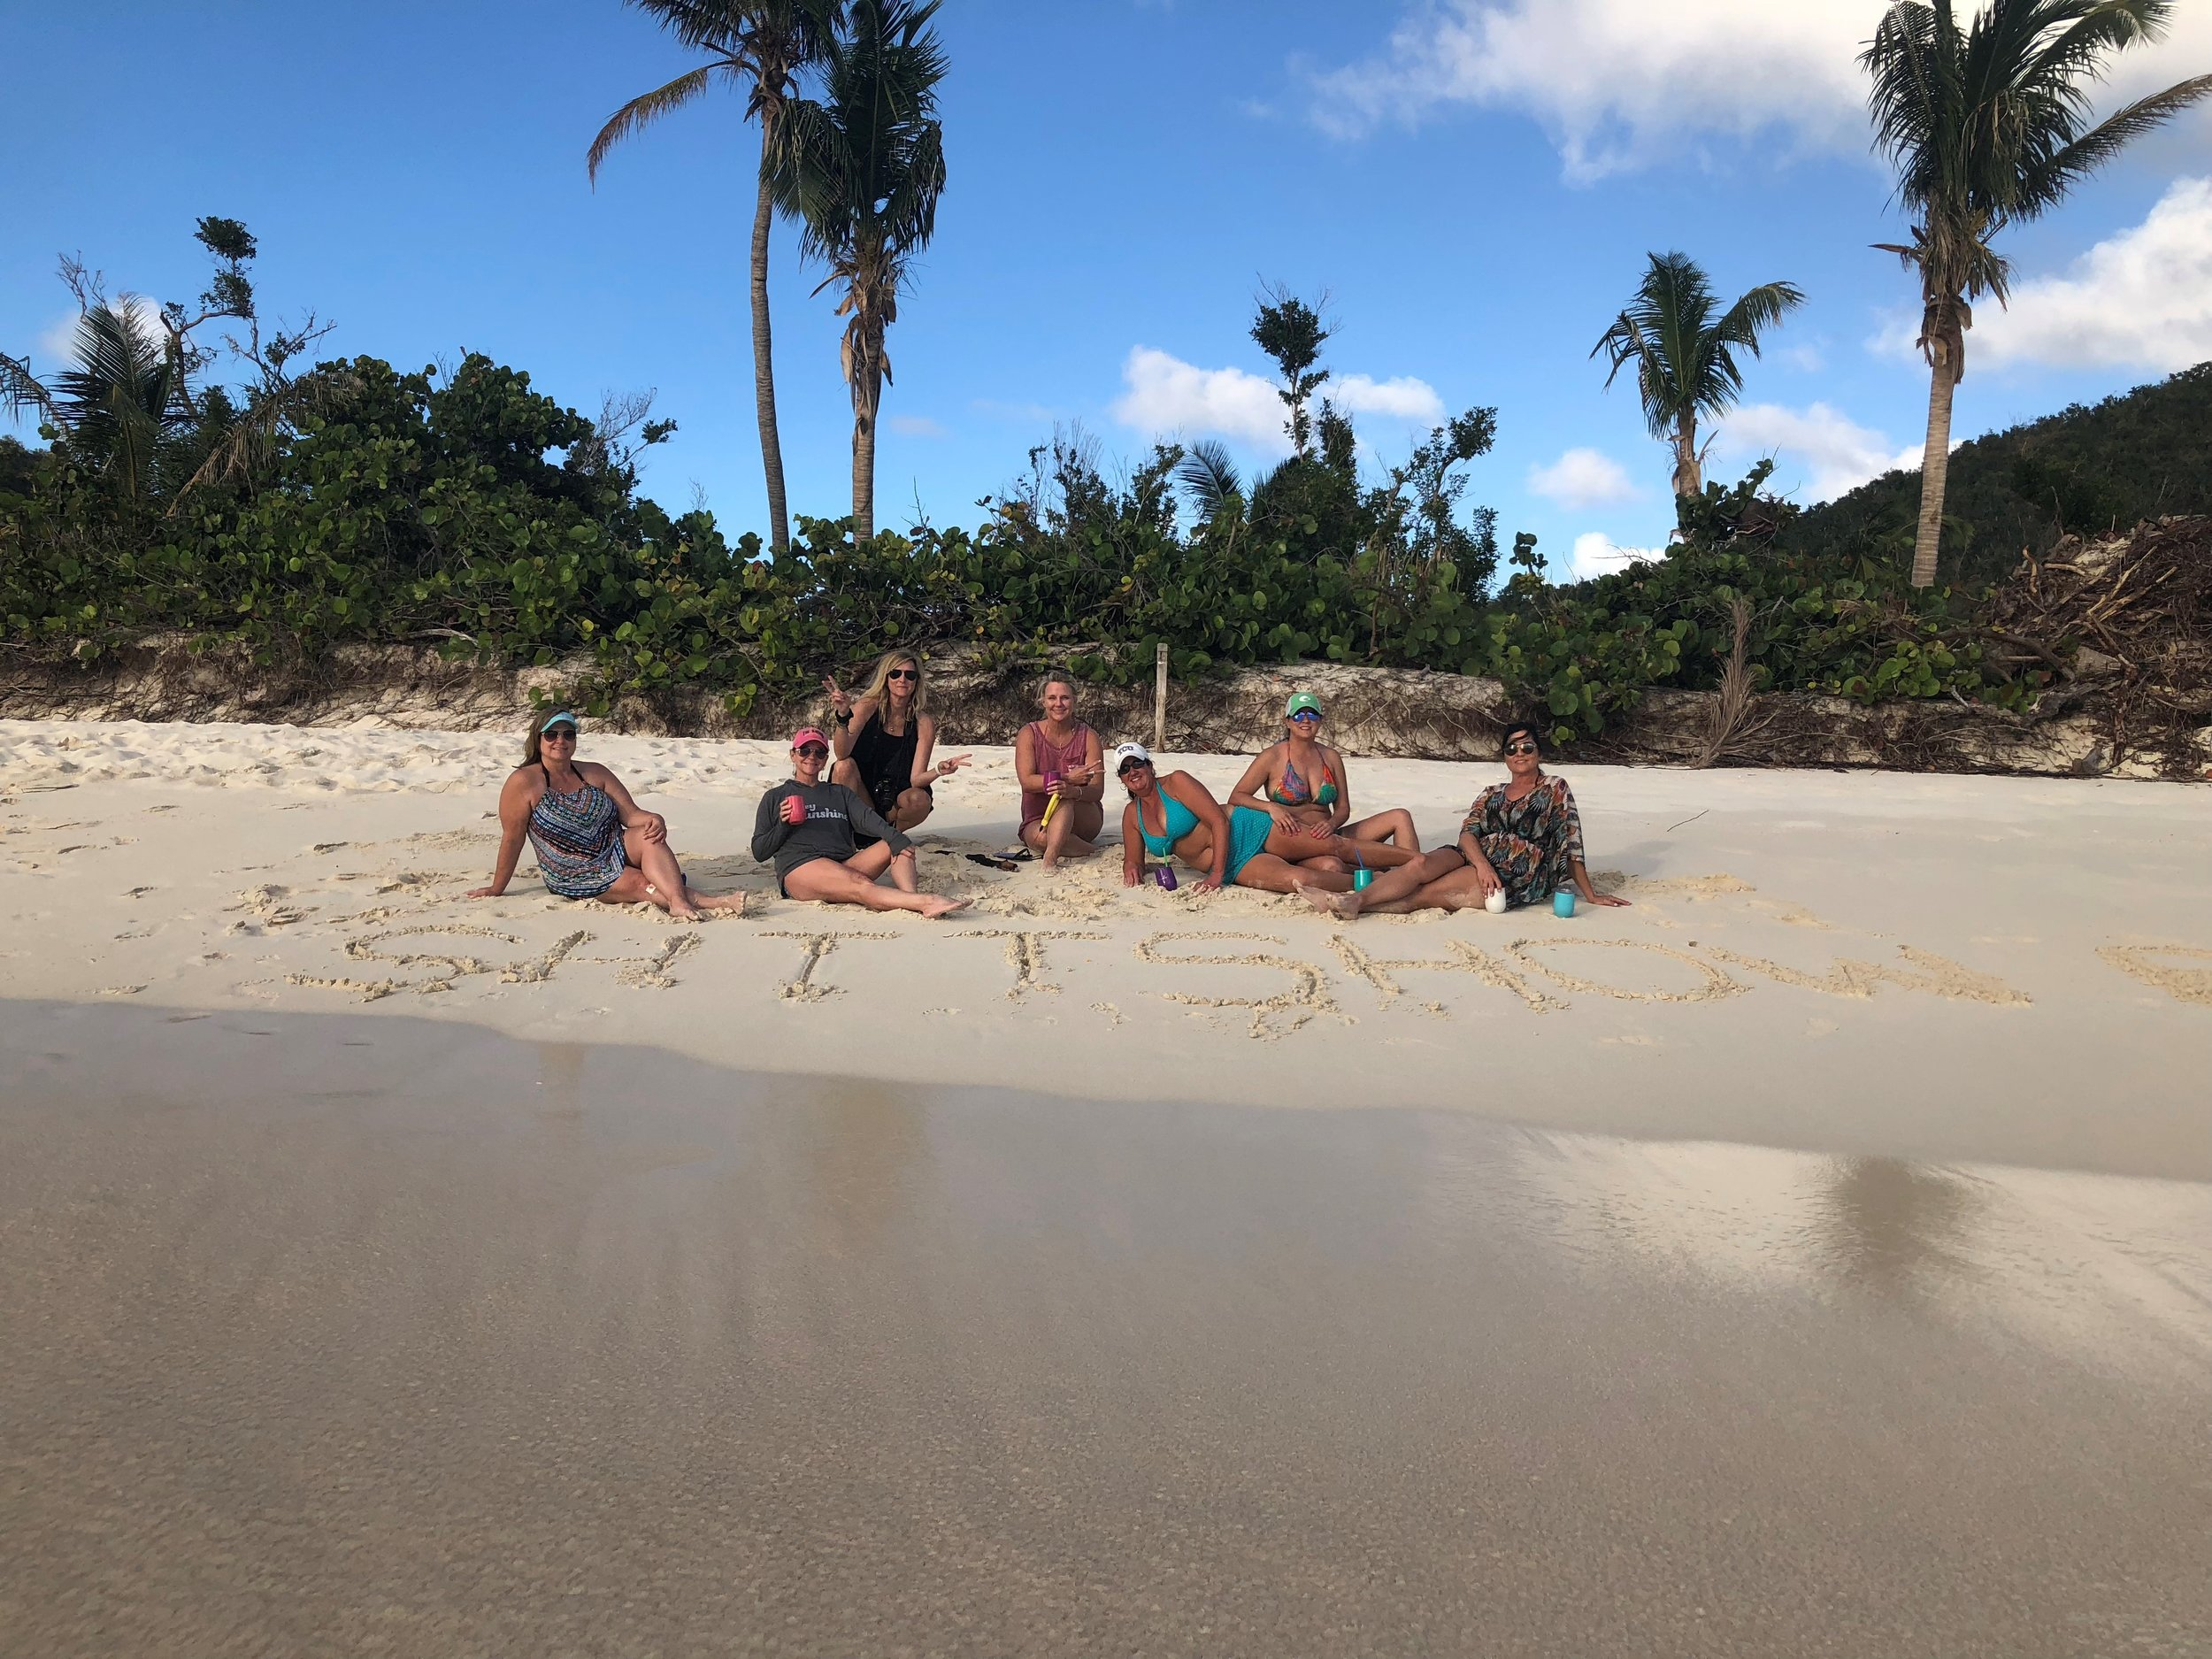 Beach Day-Mariann-February 2018